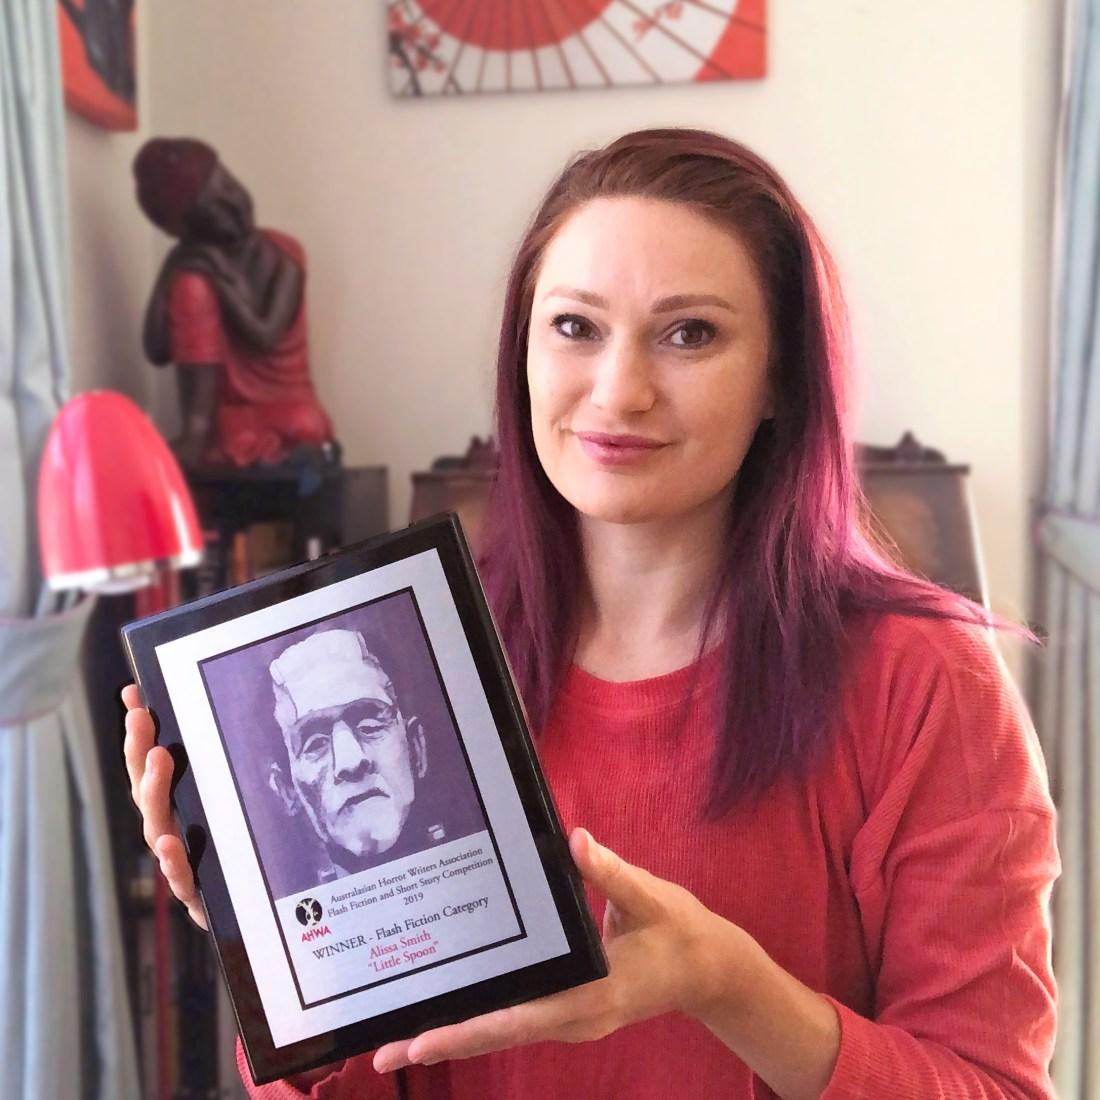 Alissa Smith writer